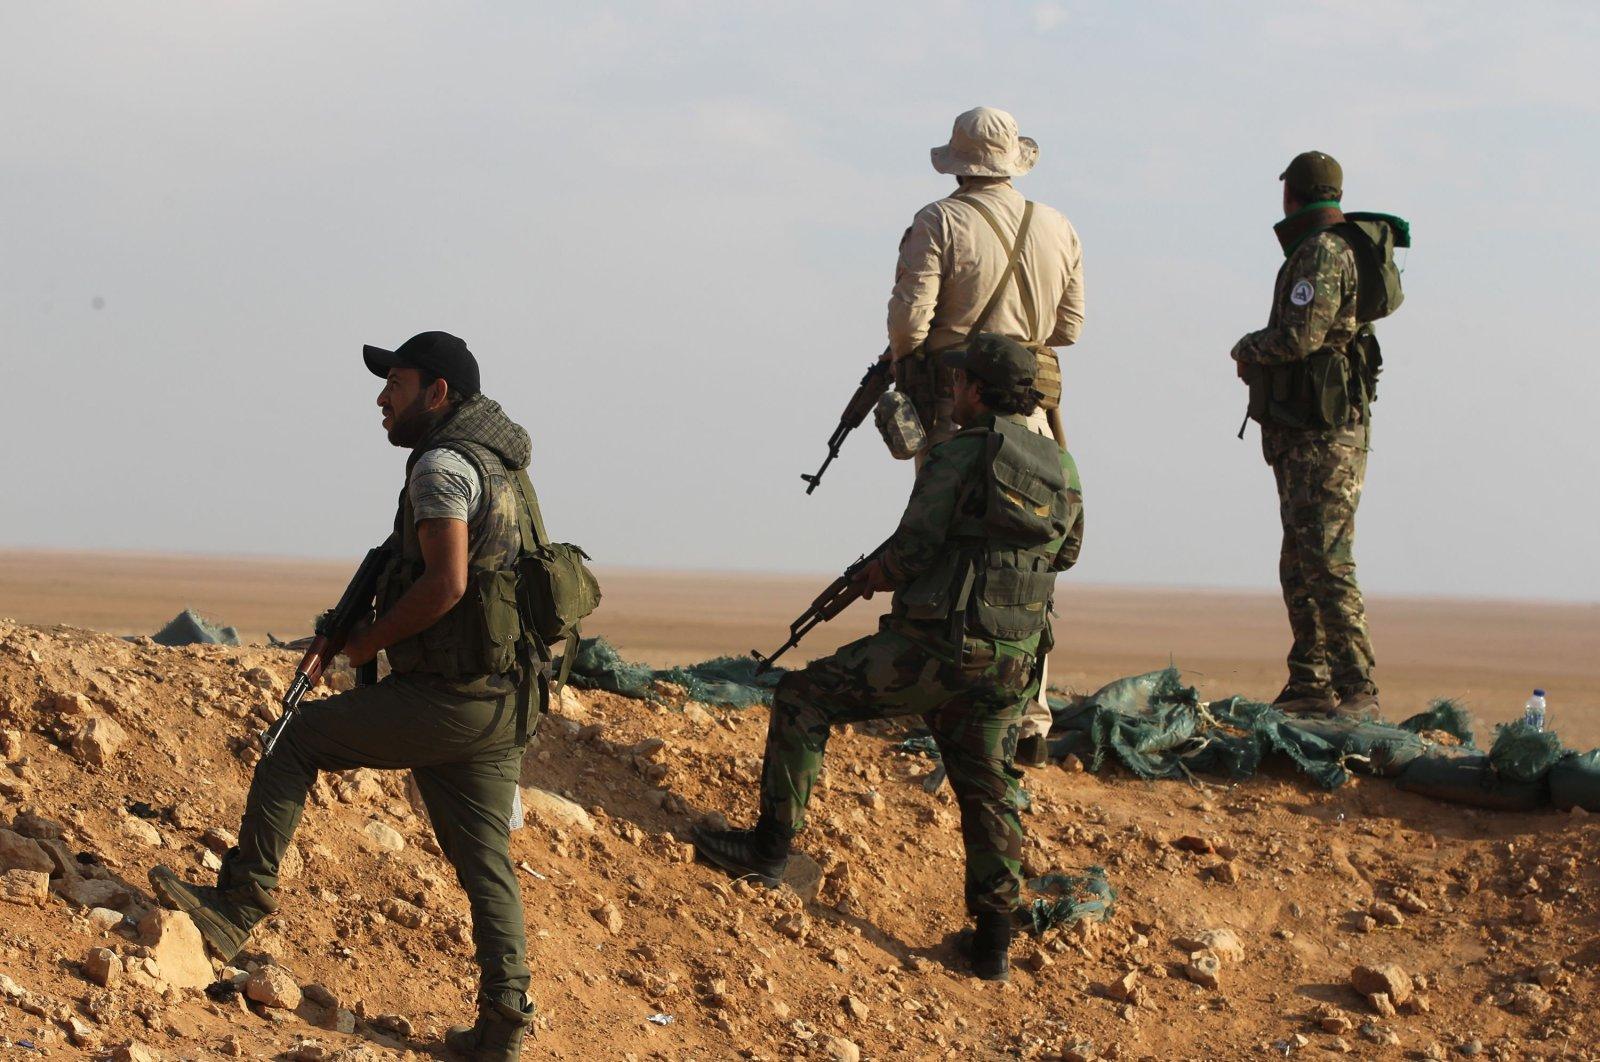 Iraqi Shiite members of the Hashd al-Shaabi paramilitary group secure the border with Syria in al-Qaim, Anbar, Iraq, Nov. 12, 2018. (AFP Photo)